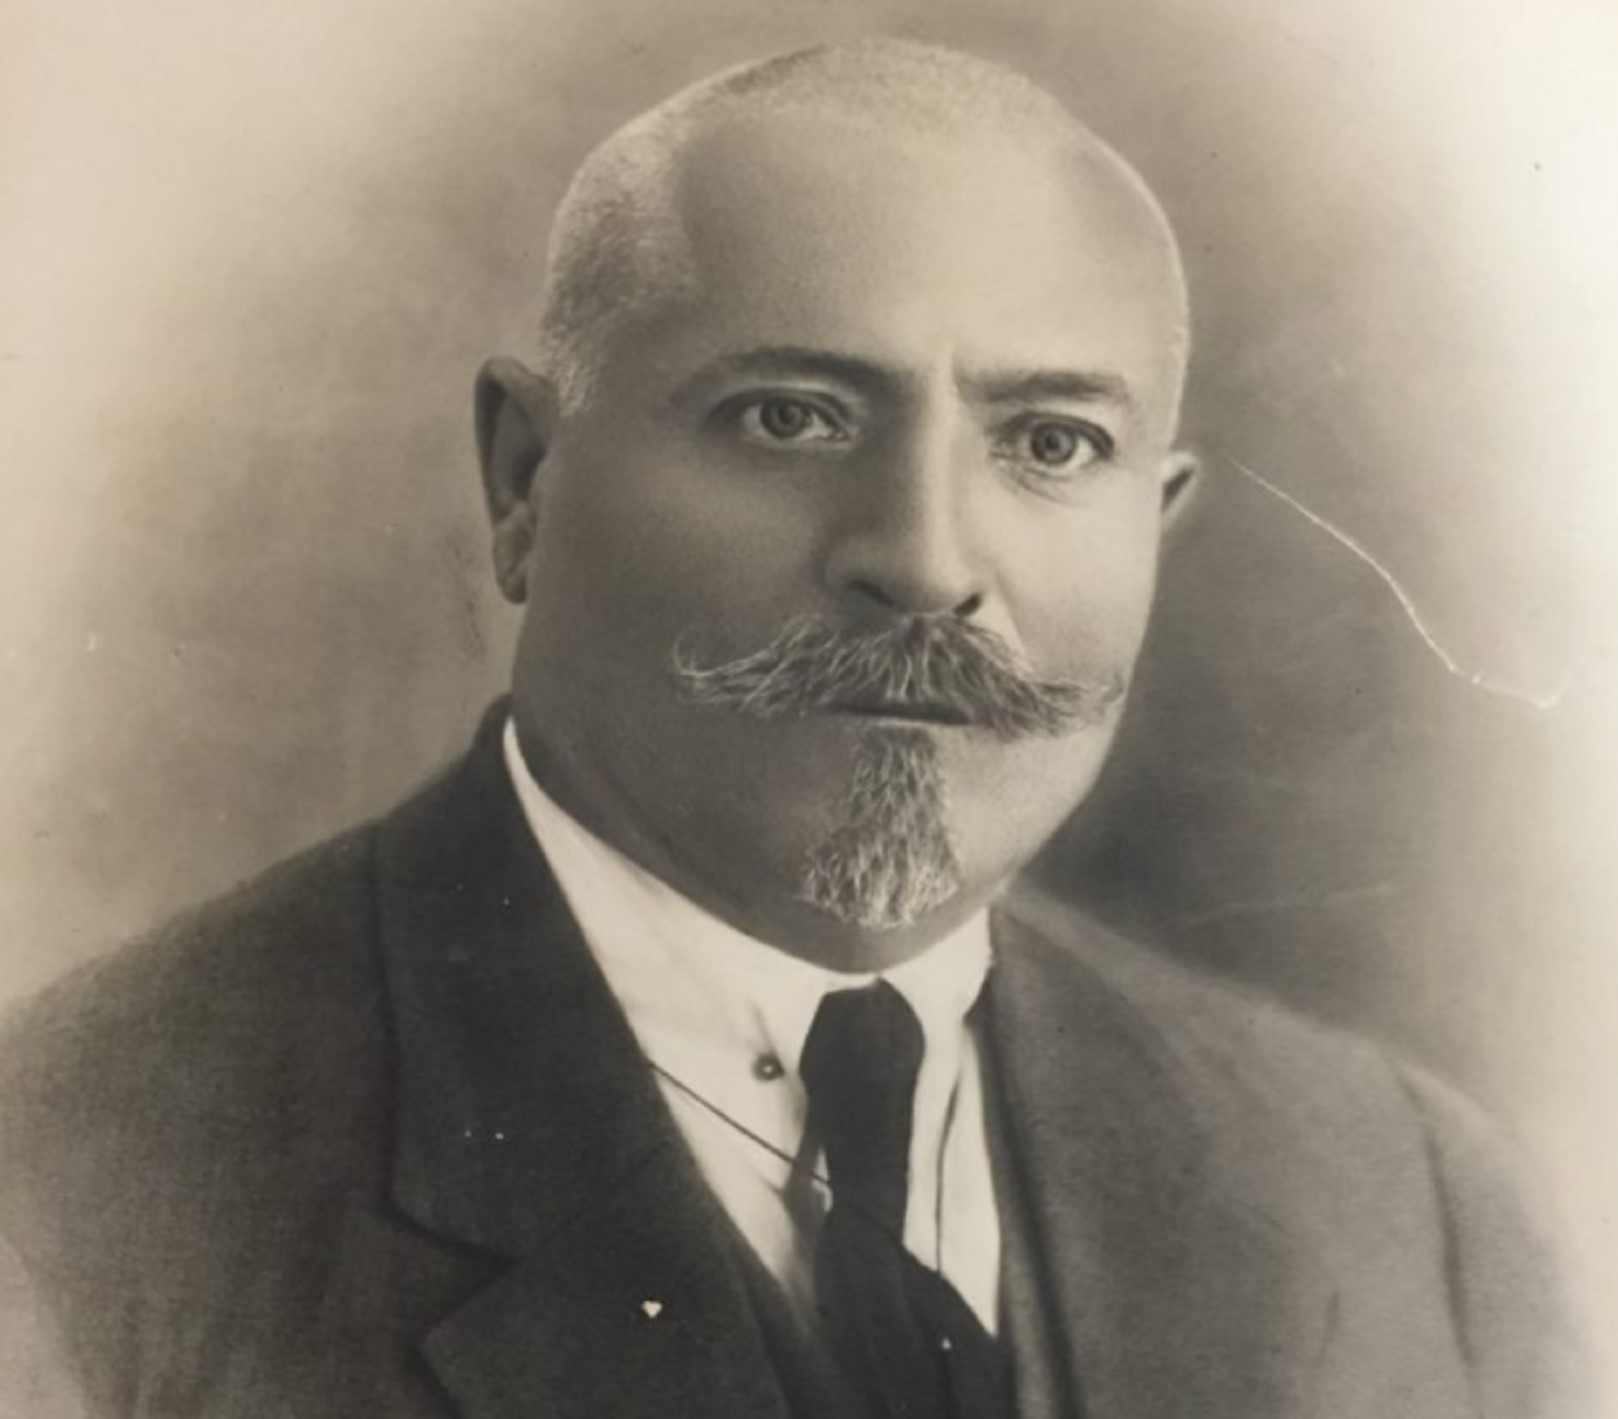 Fig. 3. Georgios Manolakakis (1870-1953), the second son of Emmanuel Manolakakis and mayor of Pigadia for a decade (1923-1933). © Emanouel Cassotis.